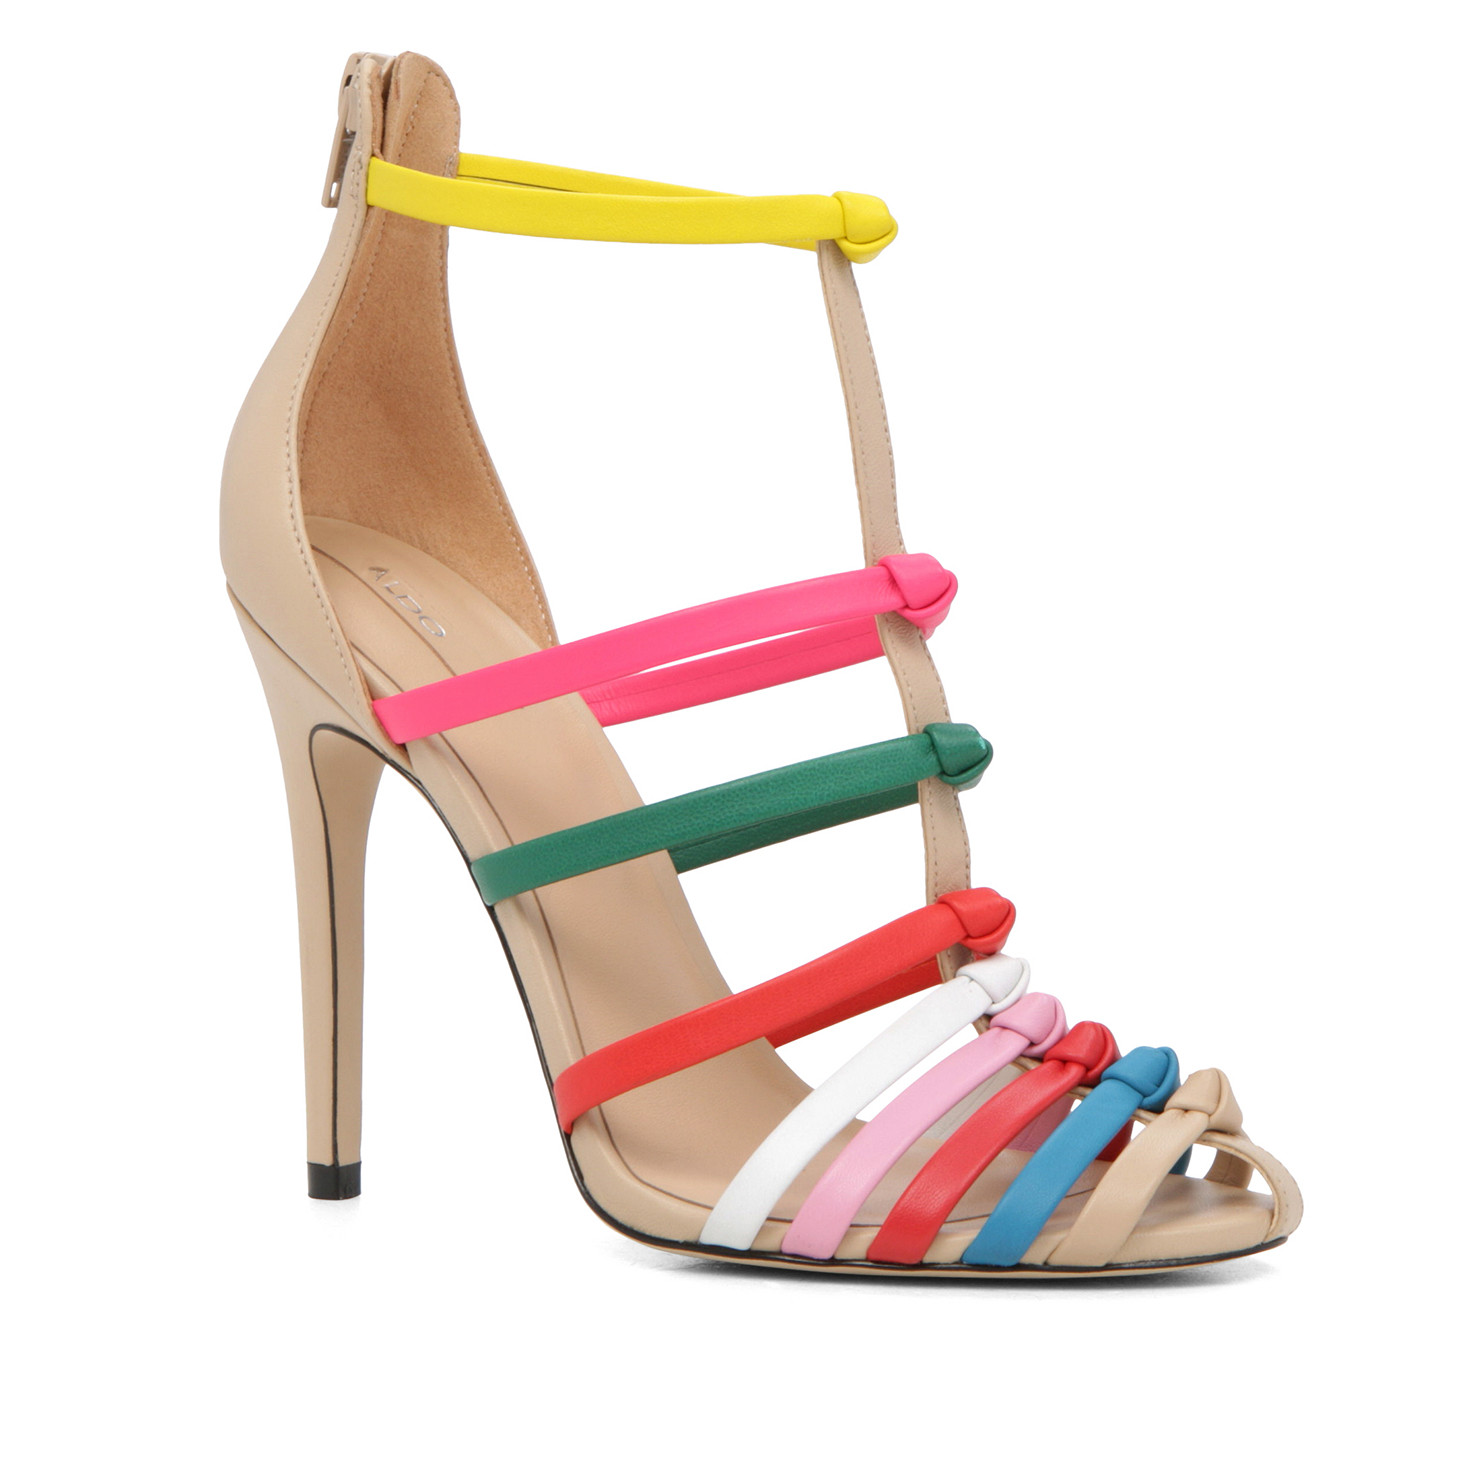 ASILAVIA High-Heel Sandals | Women's Sandals